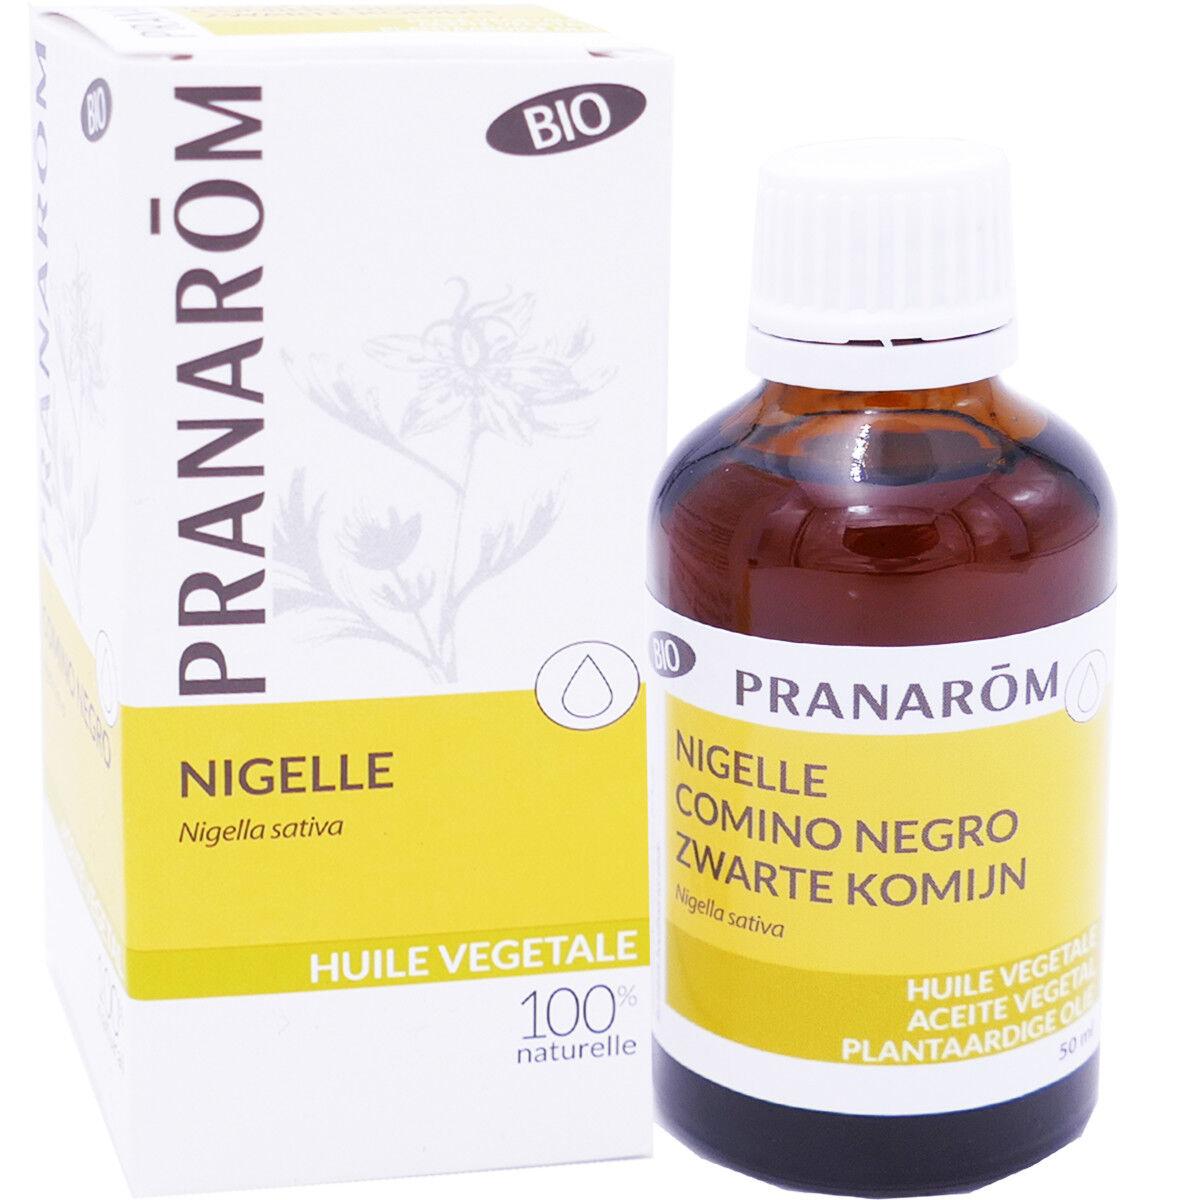 Pranarom nigelle huile vegetale 50 ml bio